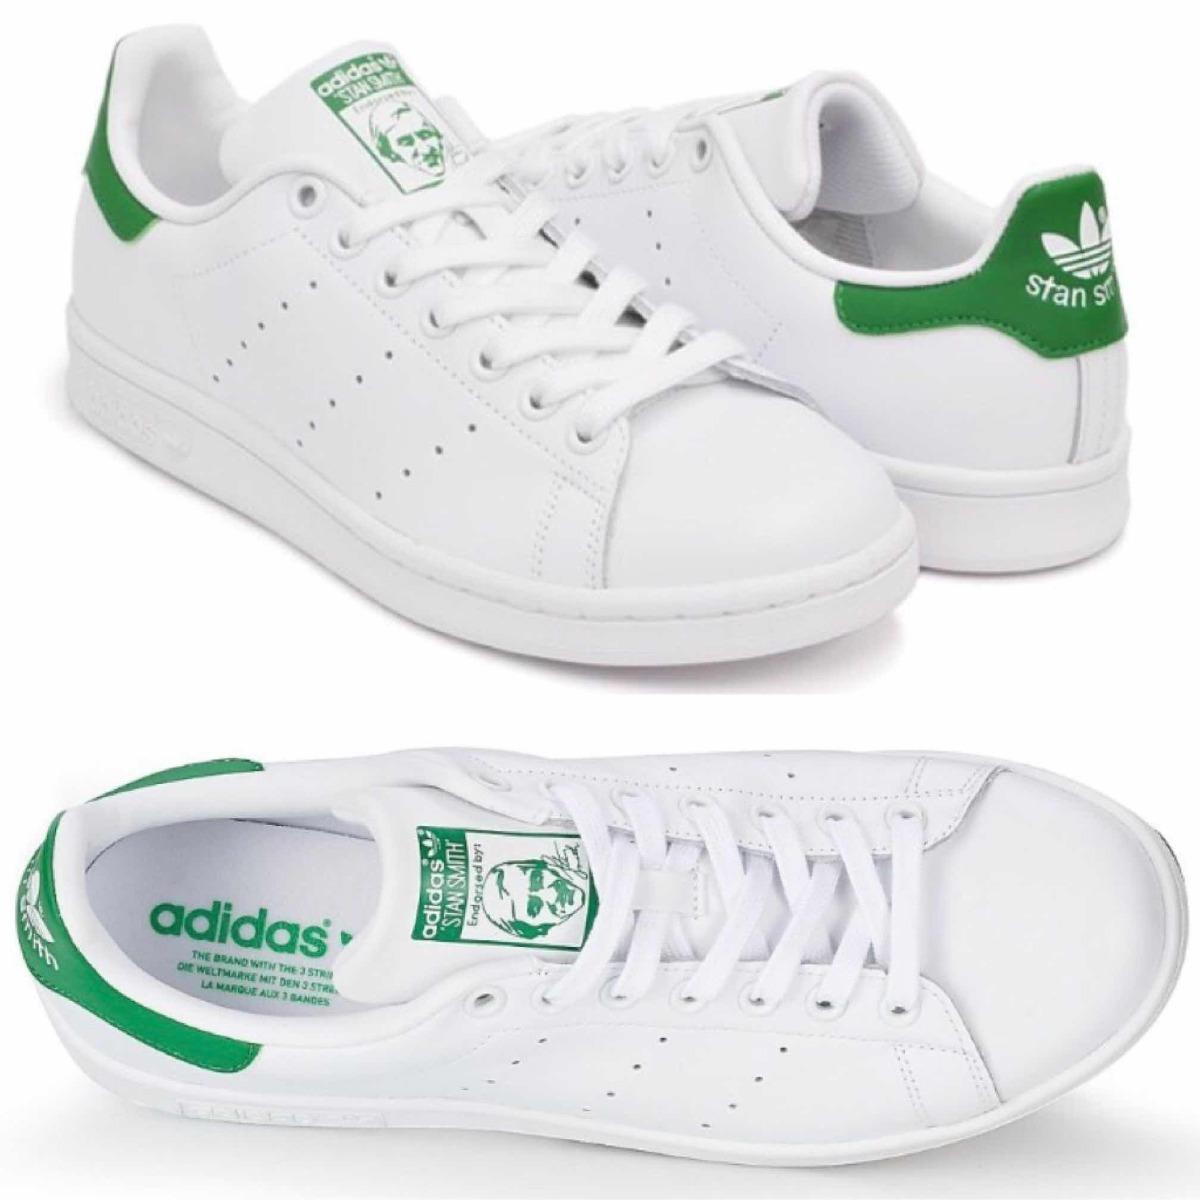 f7d1409398f93 Tenis adidas Stan Smith Clasico B v (  3 3.5 4 4.5 5 5.5 Mx ...